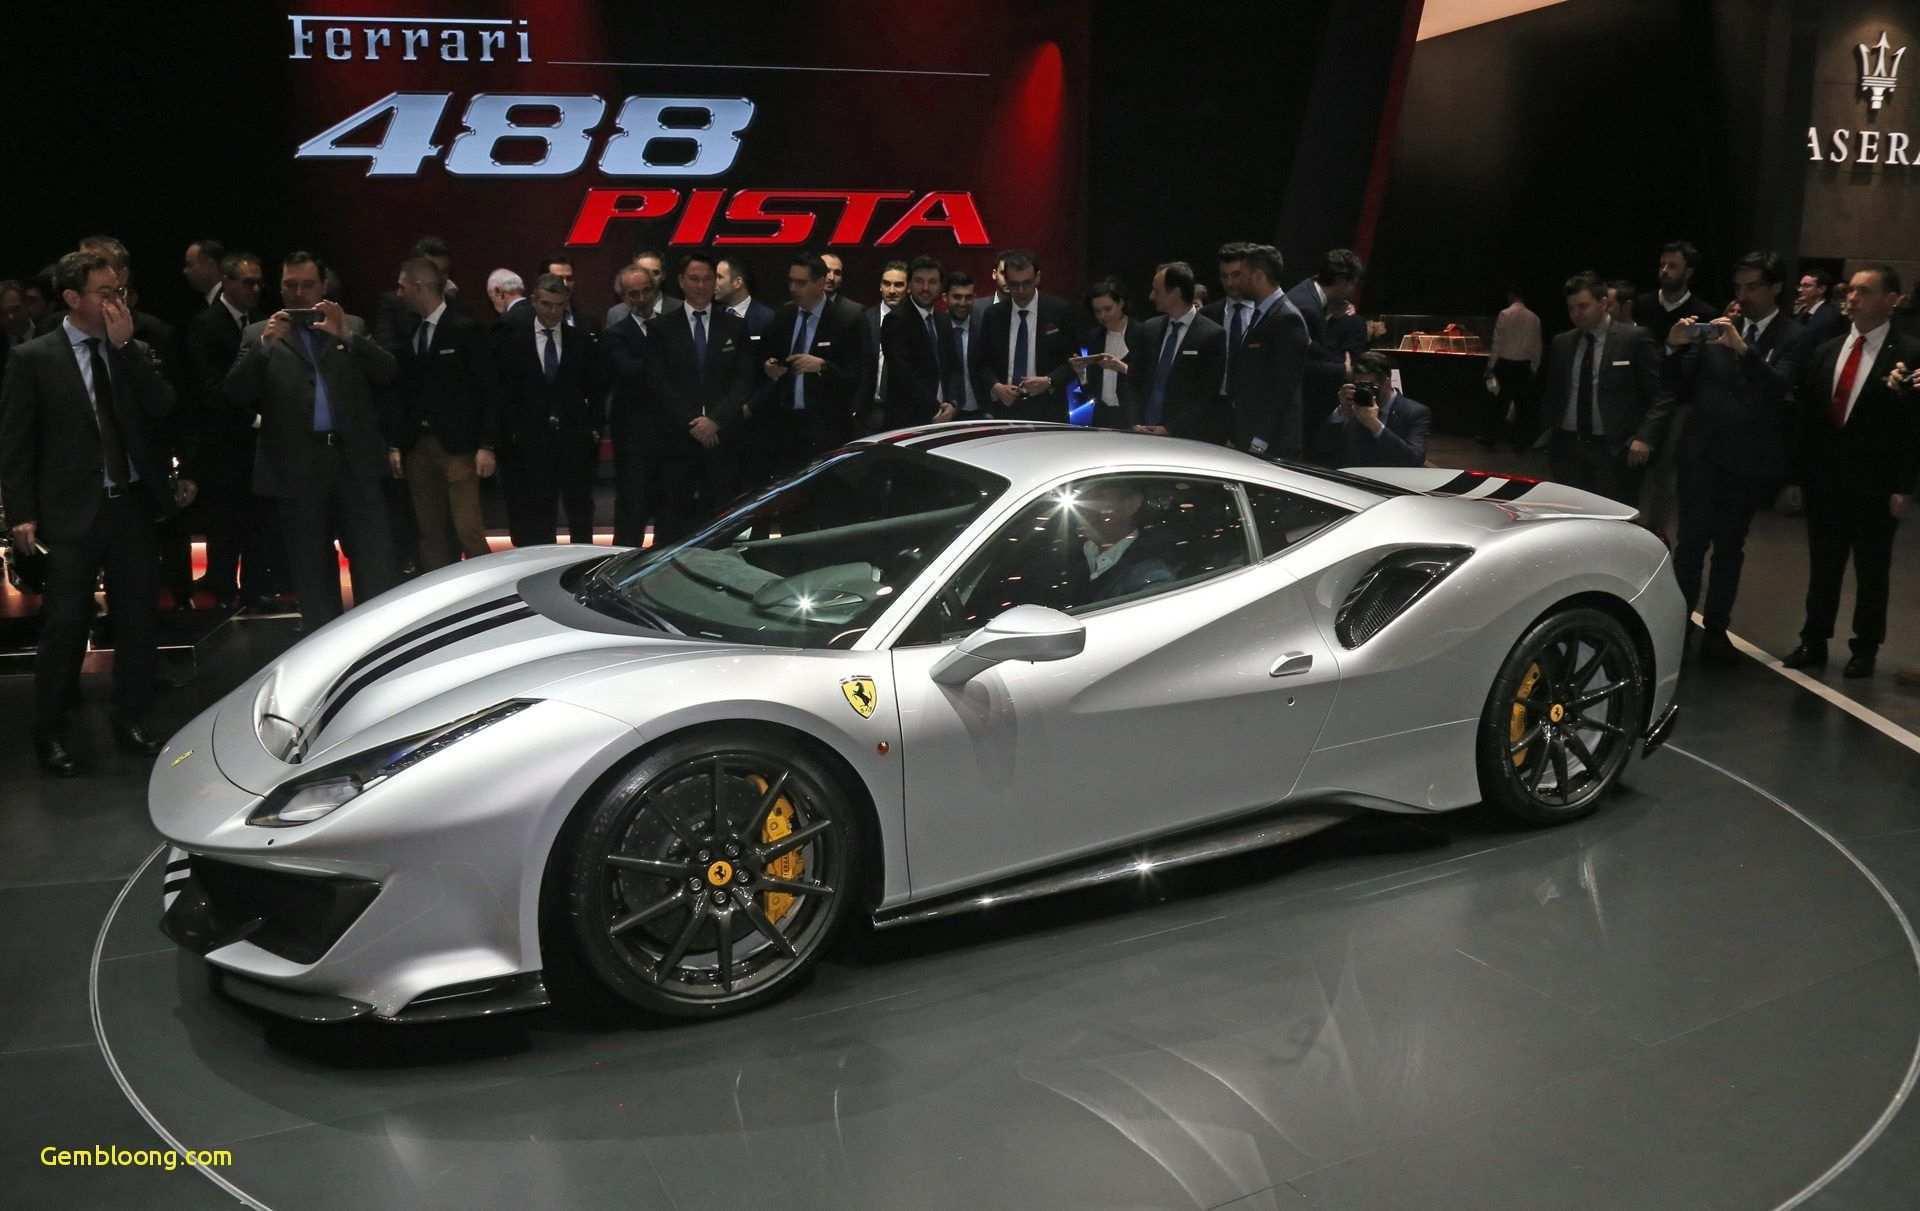 20 Great 2020 Ferrari 488 GTB History for 2020 Ferrari 488 GTB